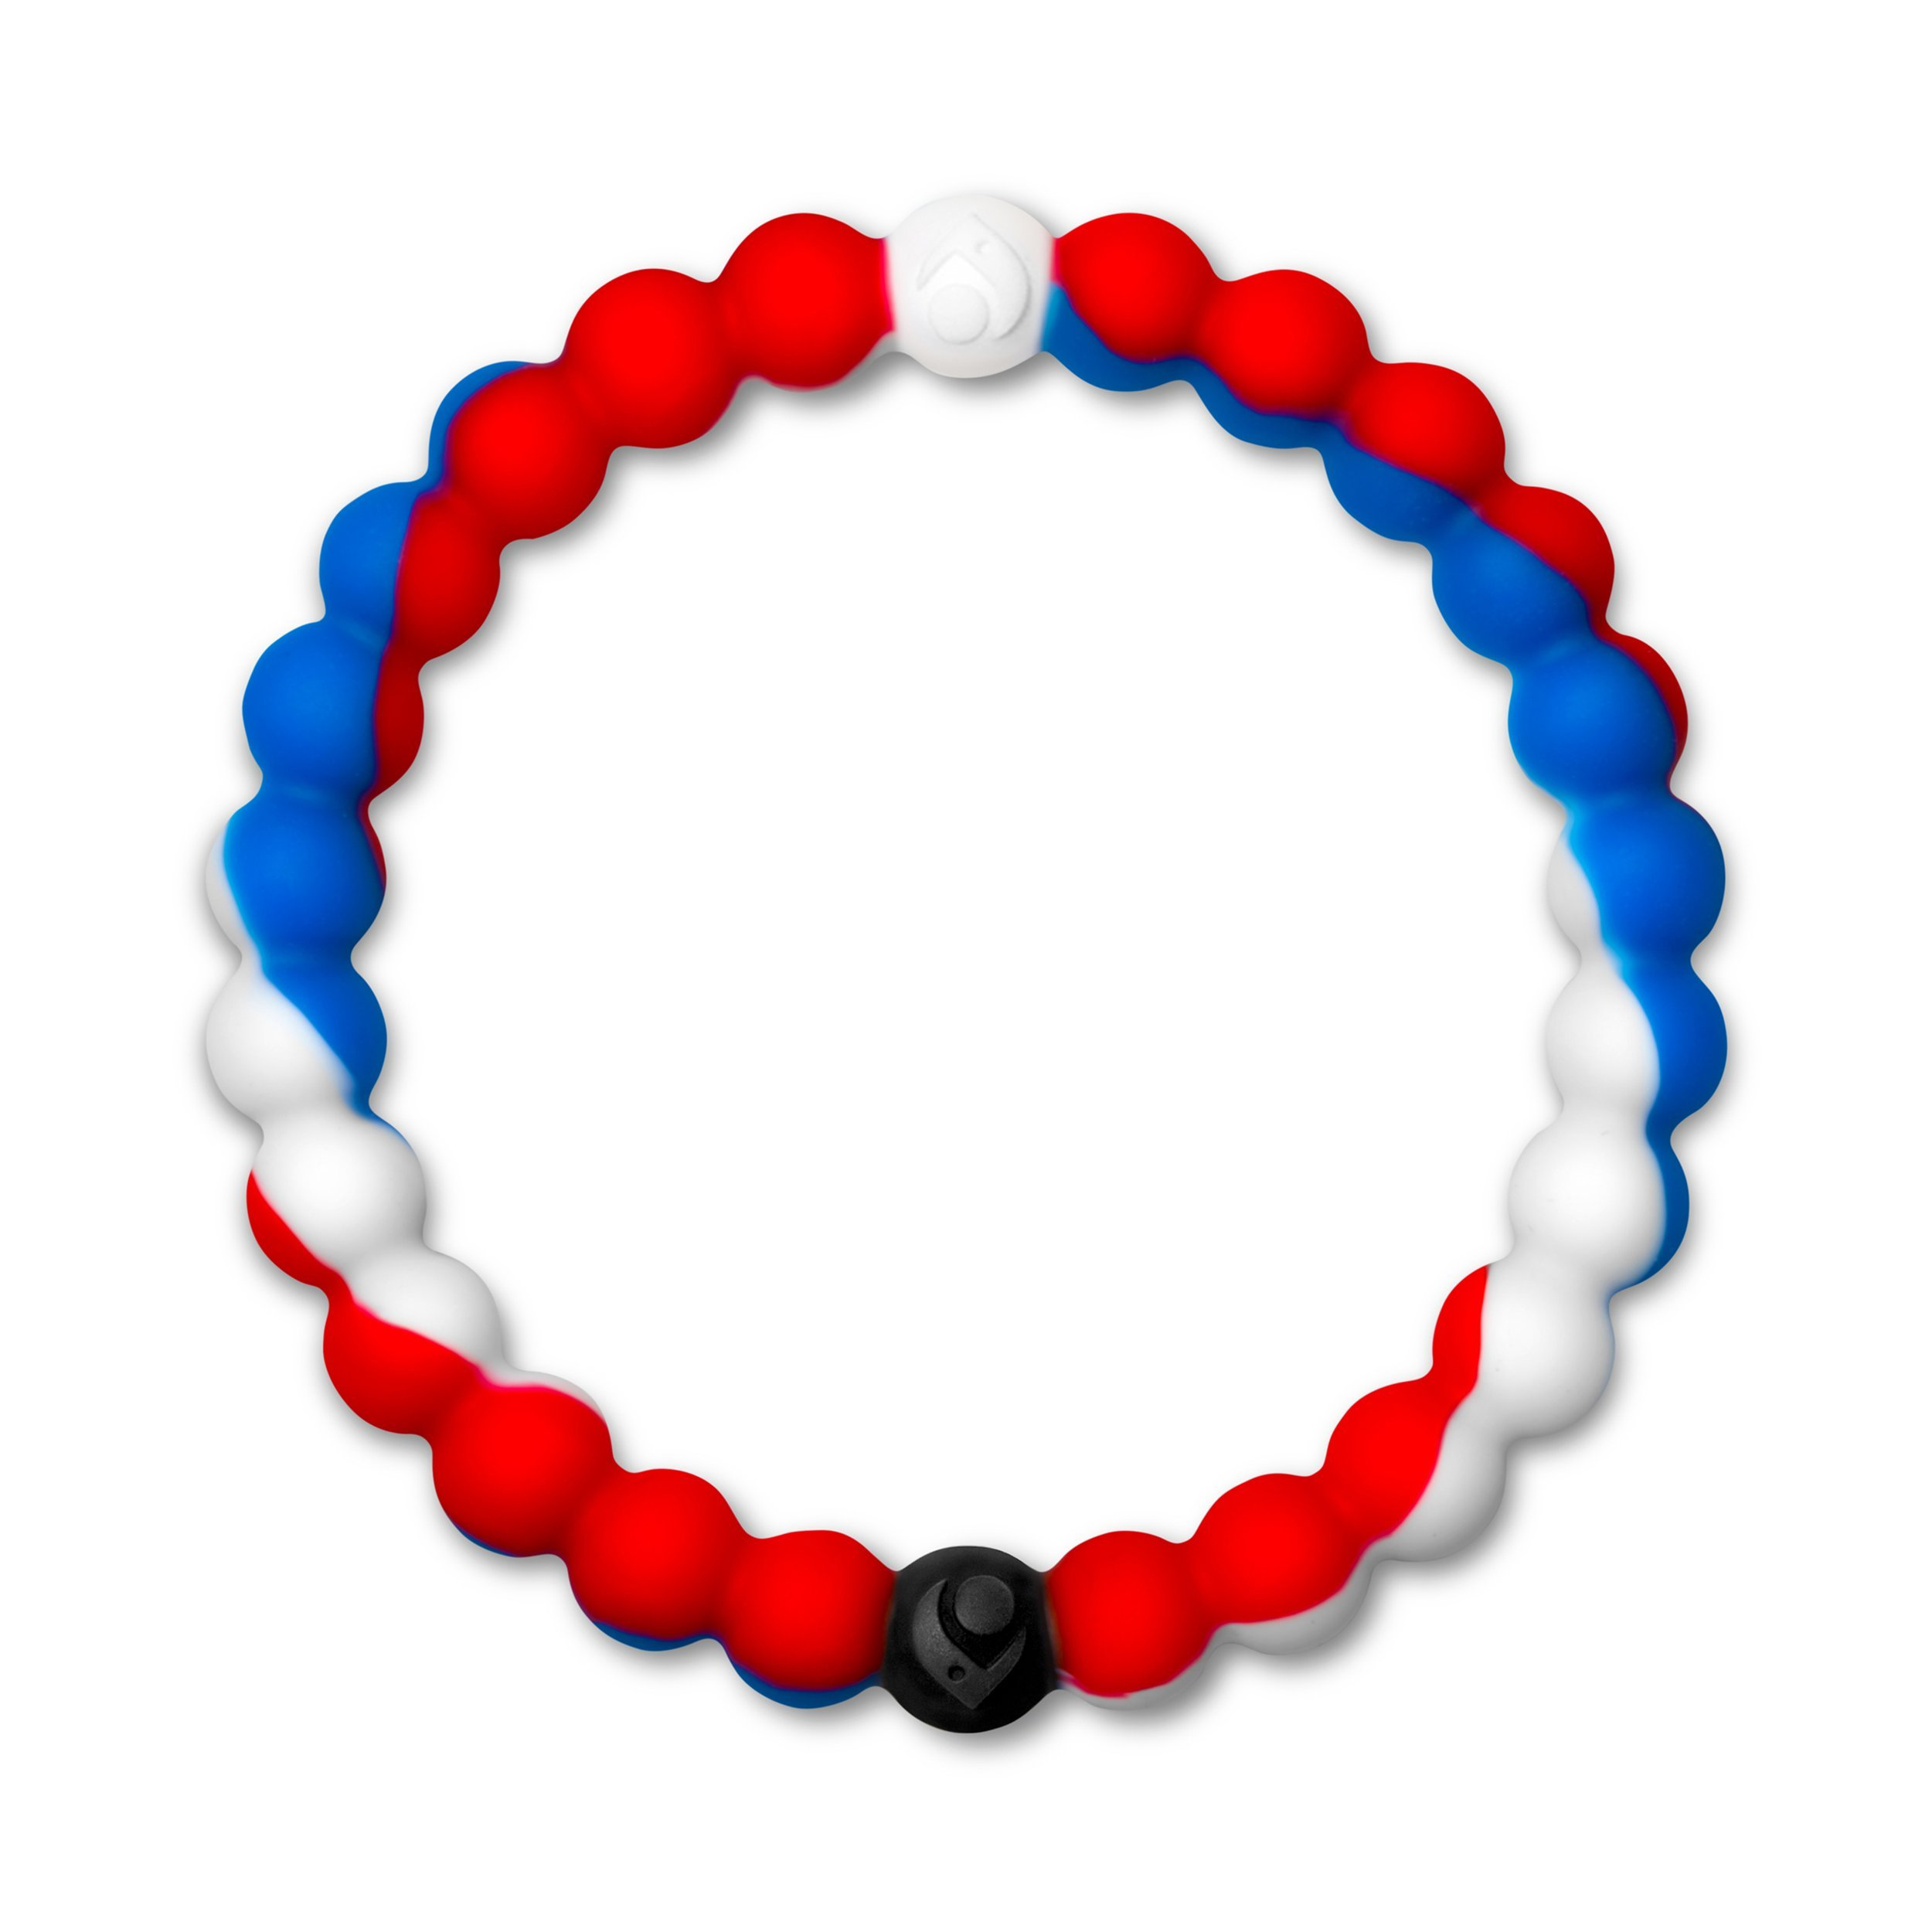 Lokai Wear Your World Cause Bracelet, Blue/Red/White, 6.5'' - Medium by Lokai